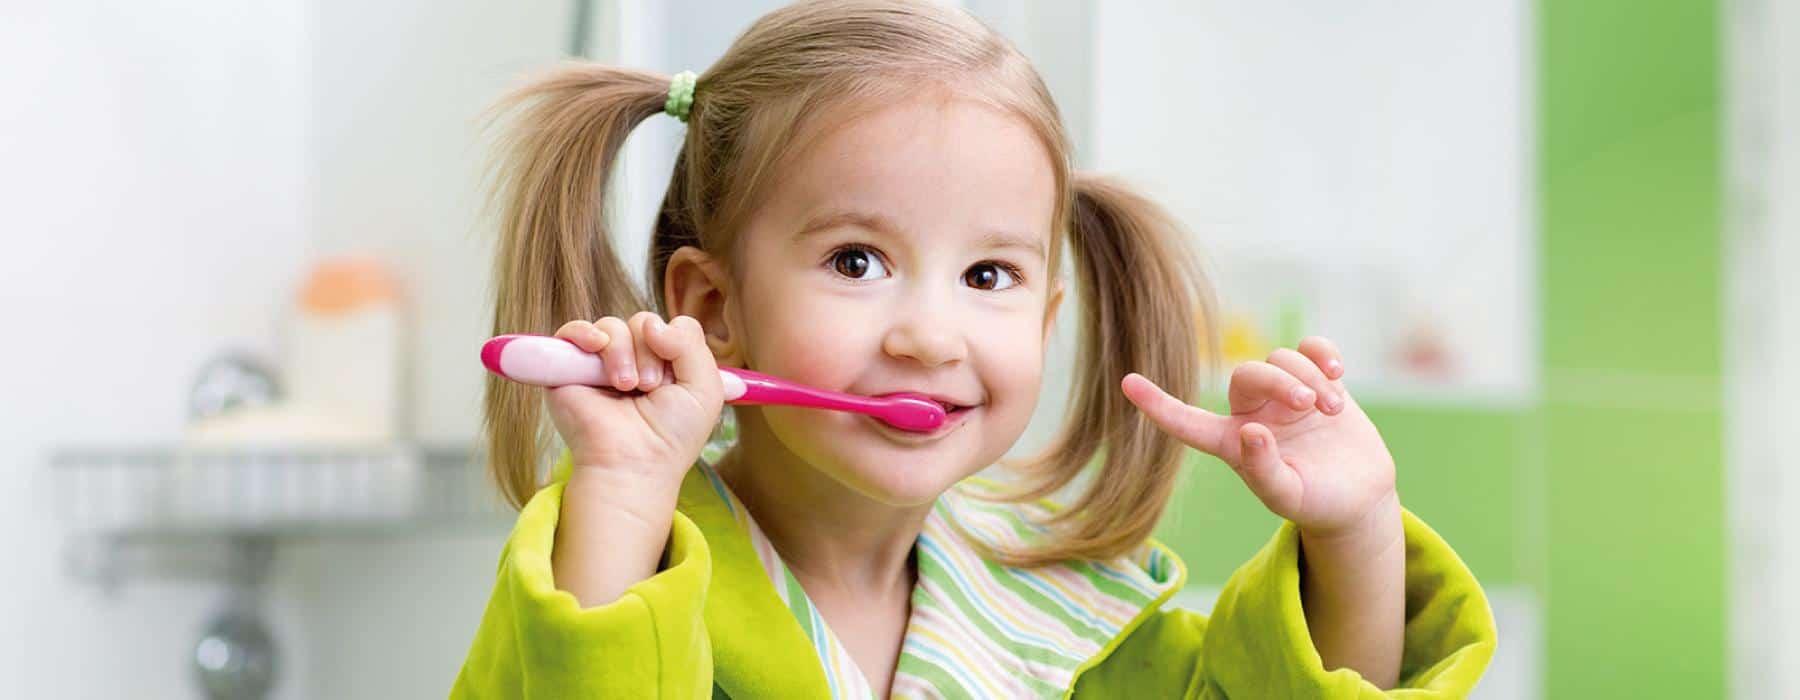 ortodontia idade